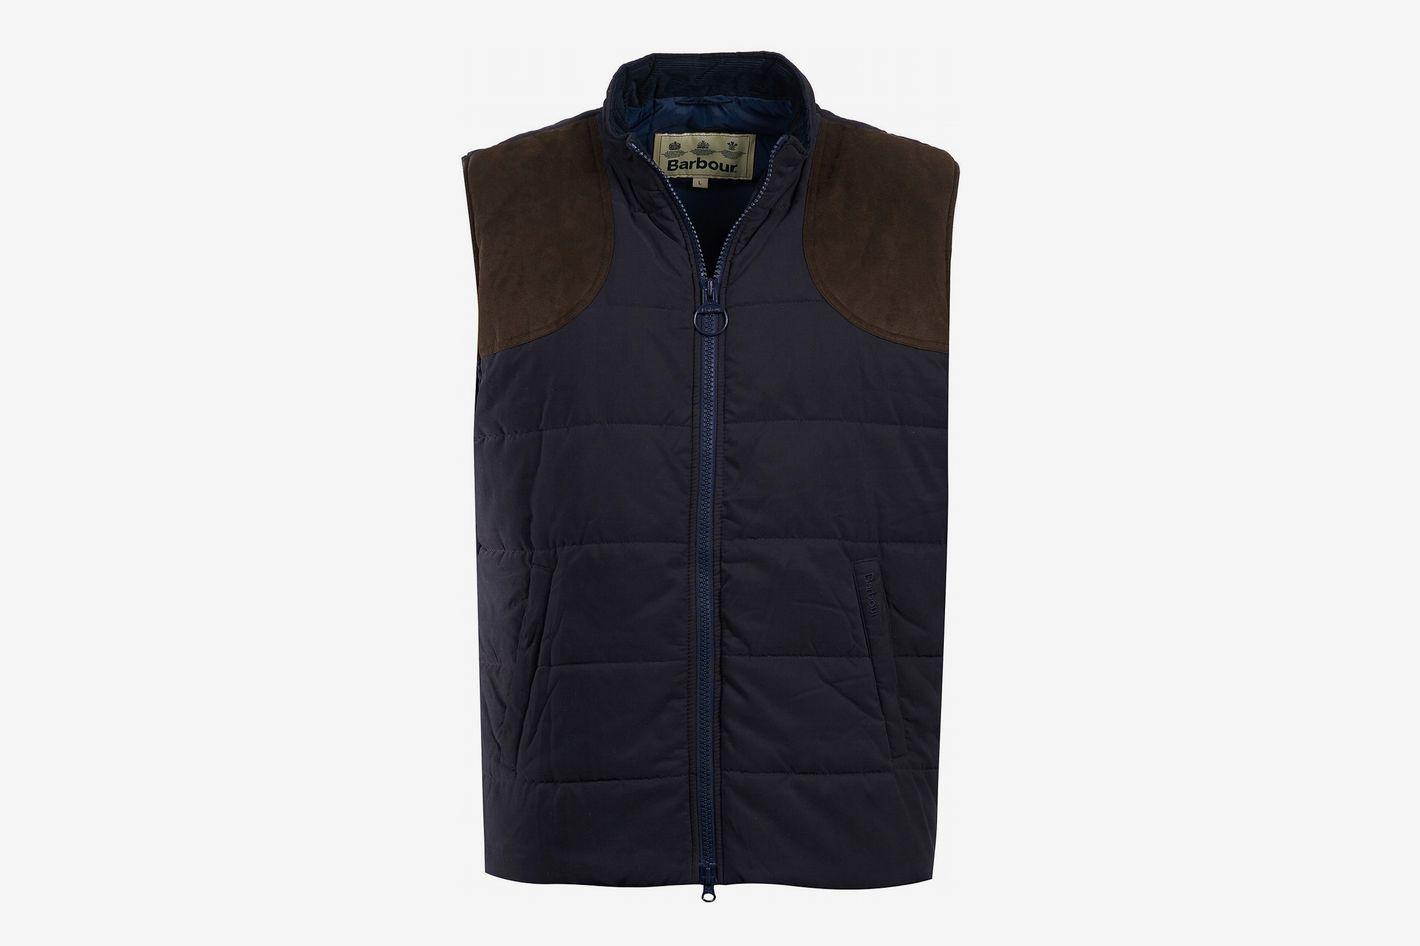 Barbour Ludlow Gilet Vest